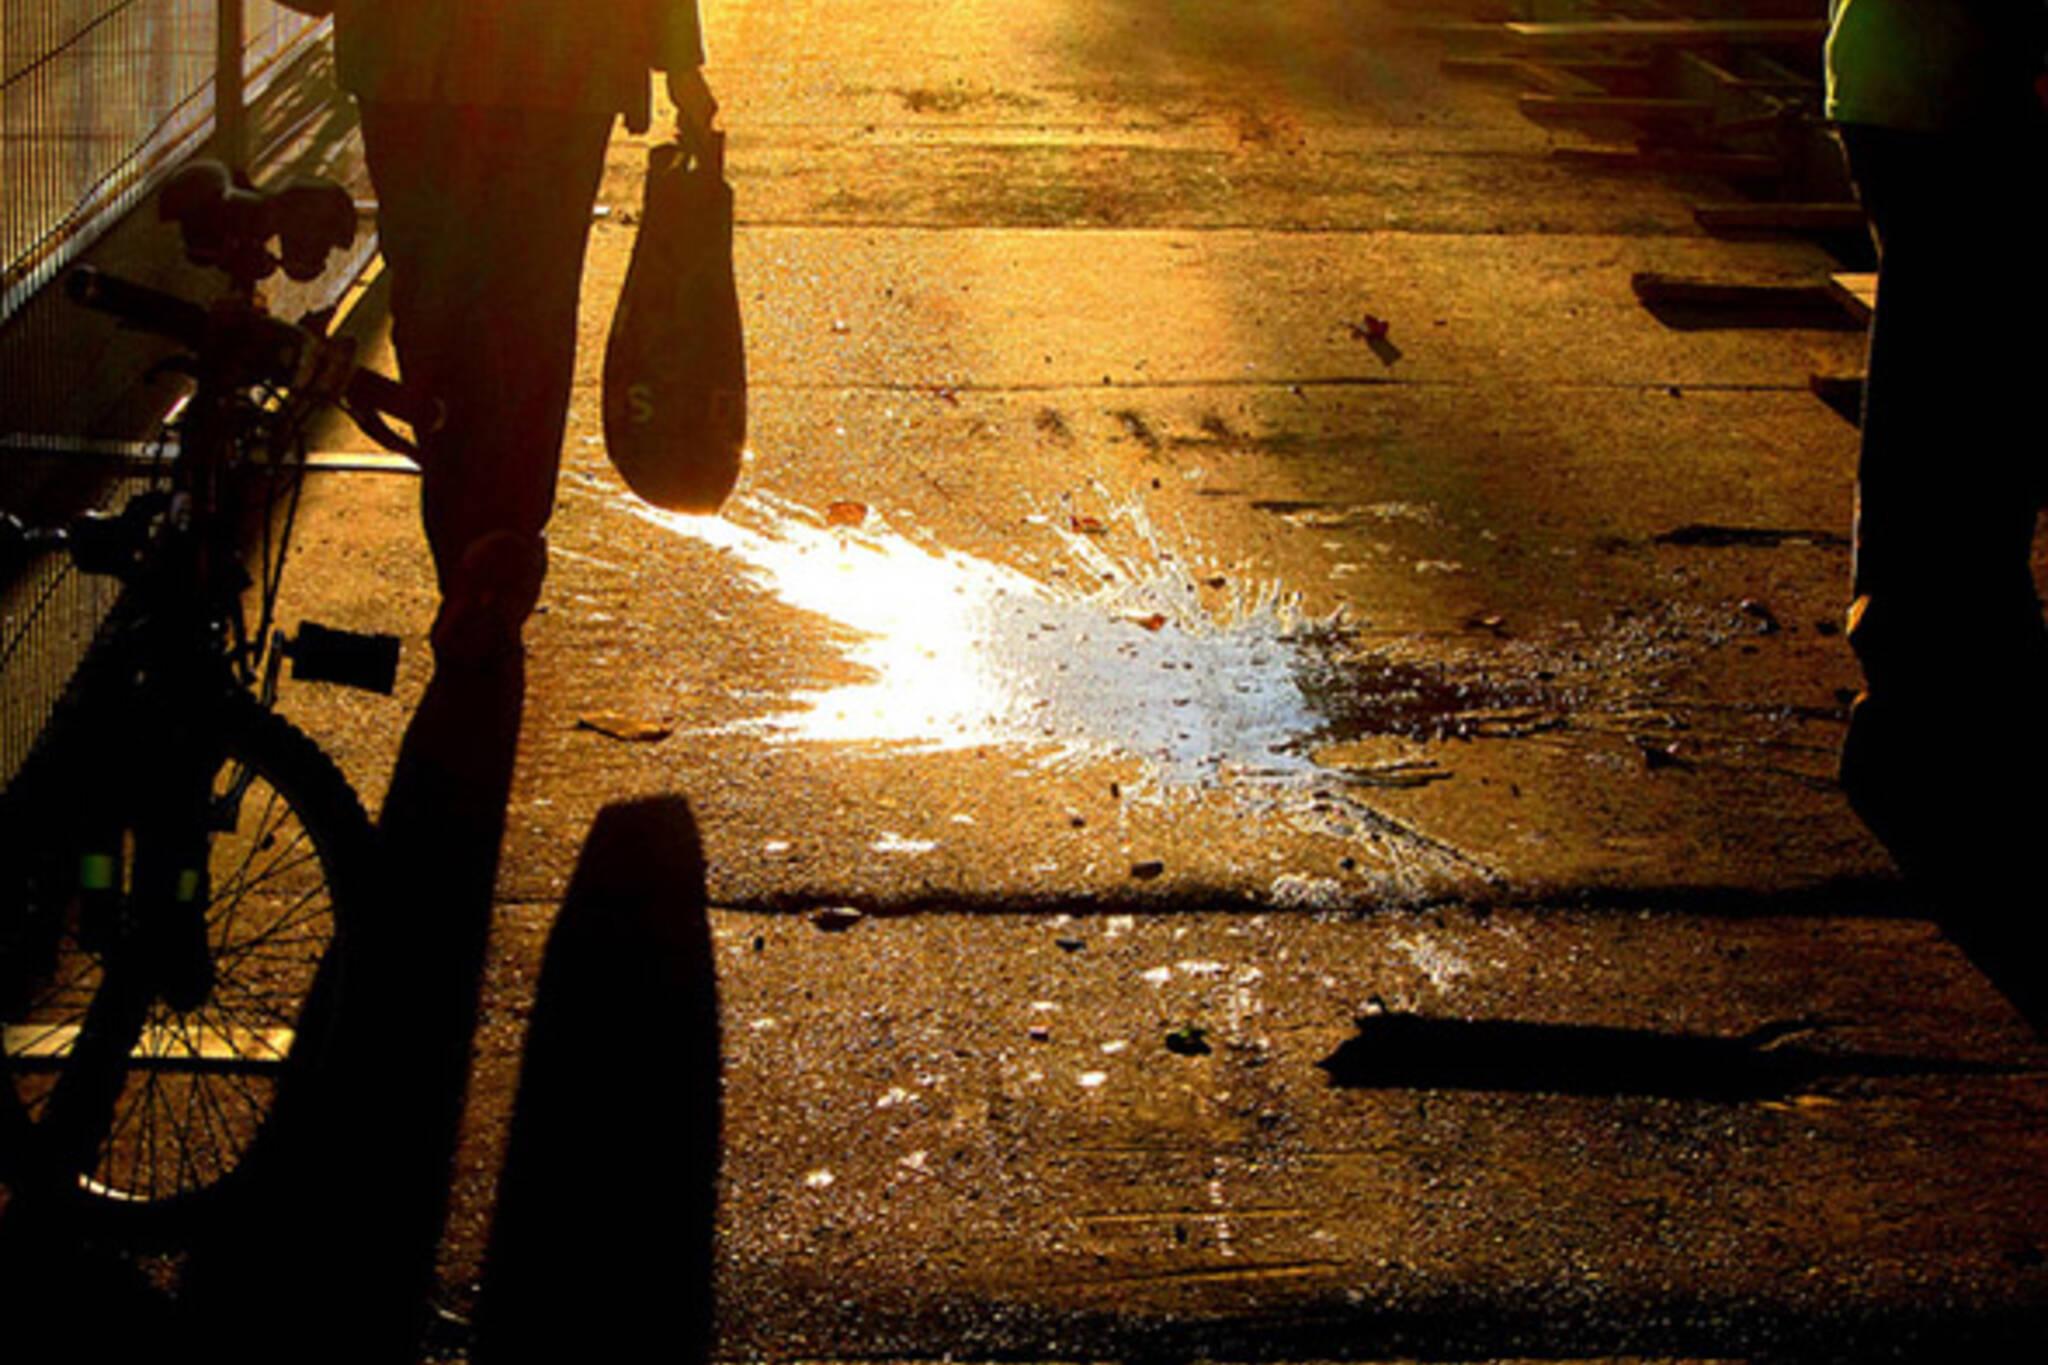 toronto, shadow, spill